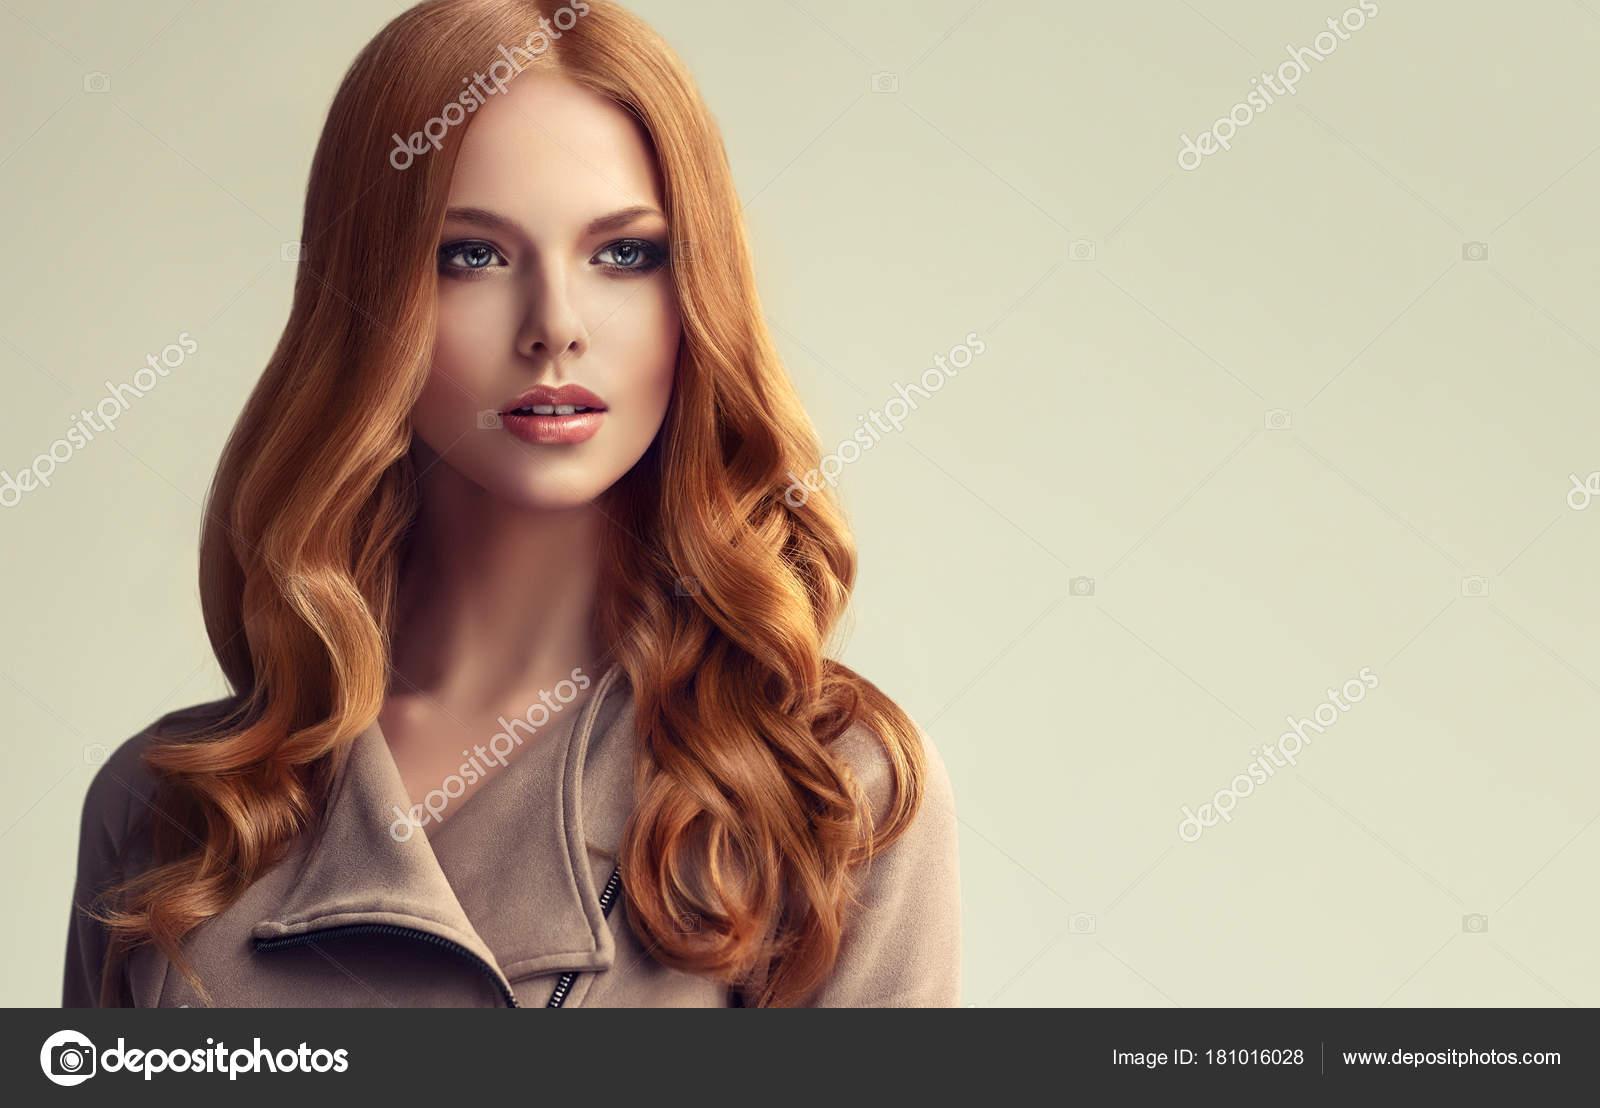 Red Hair Girl Long Shiny Curly Hair Beautiful Model Woman — Stock Photo